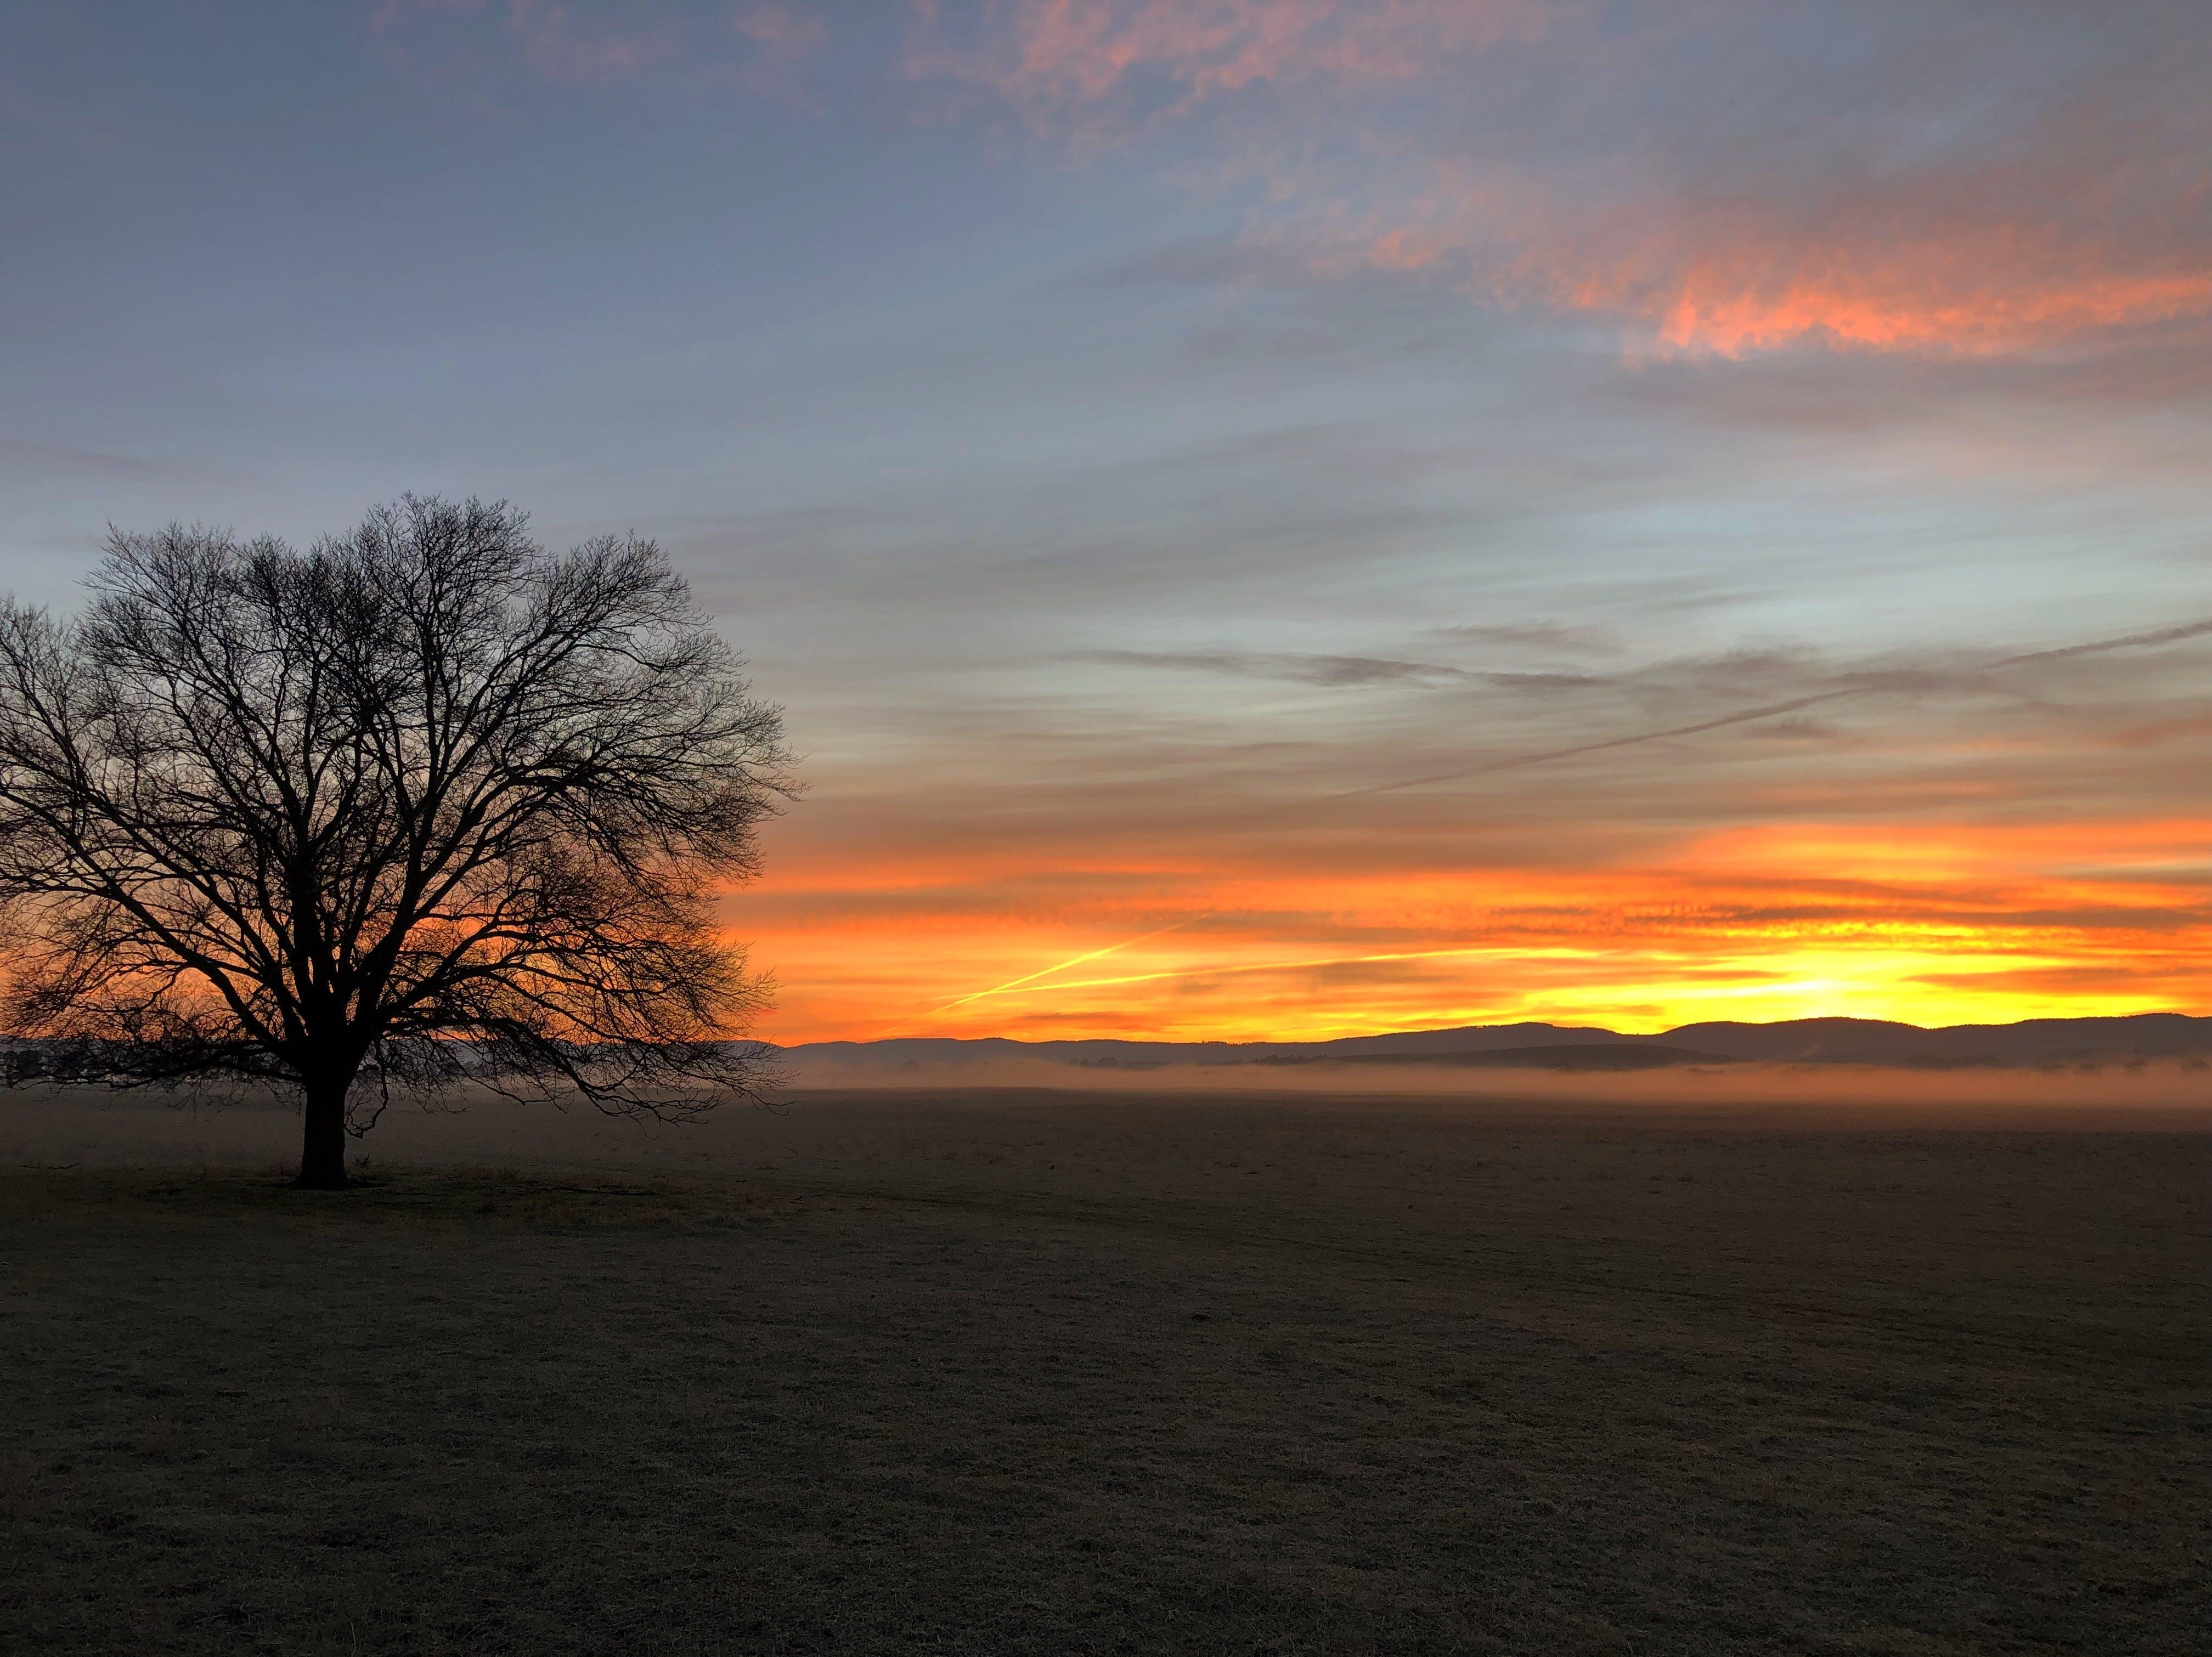 Free stock photo of Tasmanian sunrise